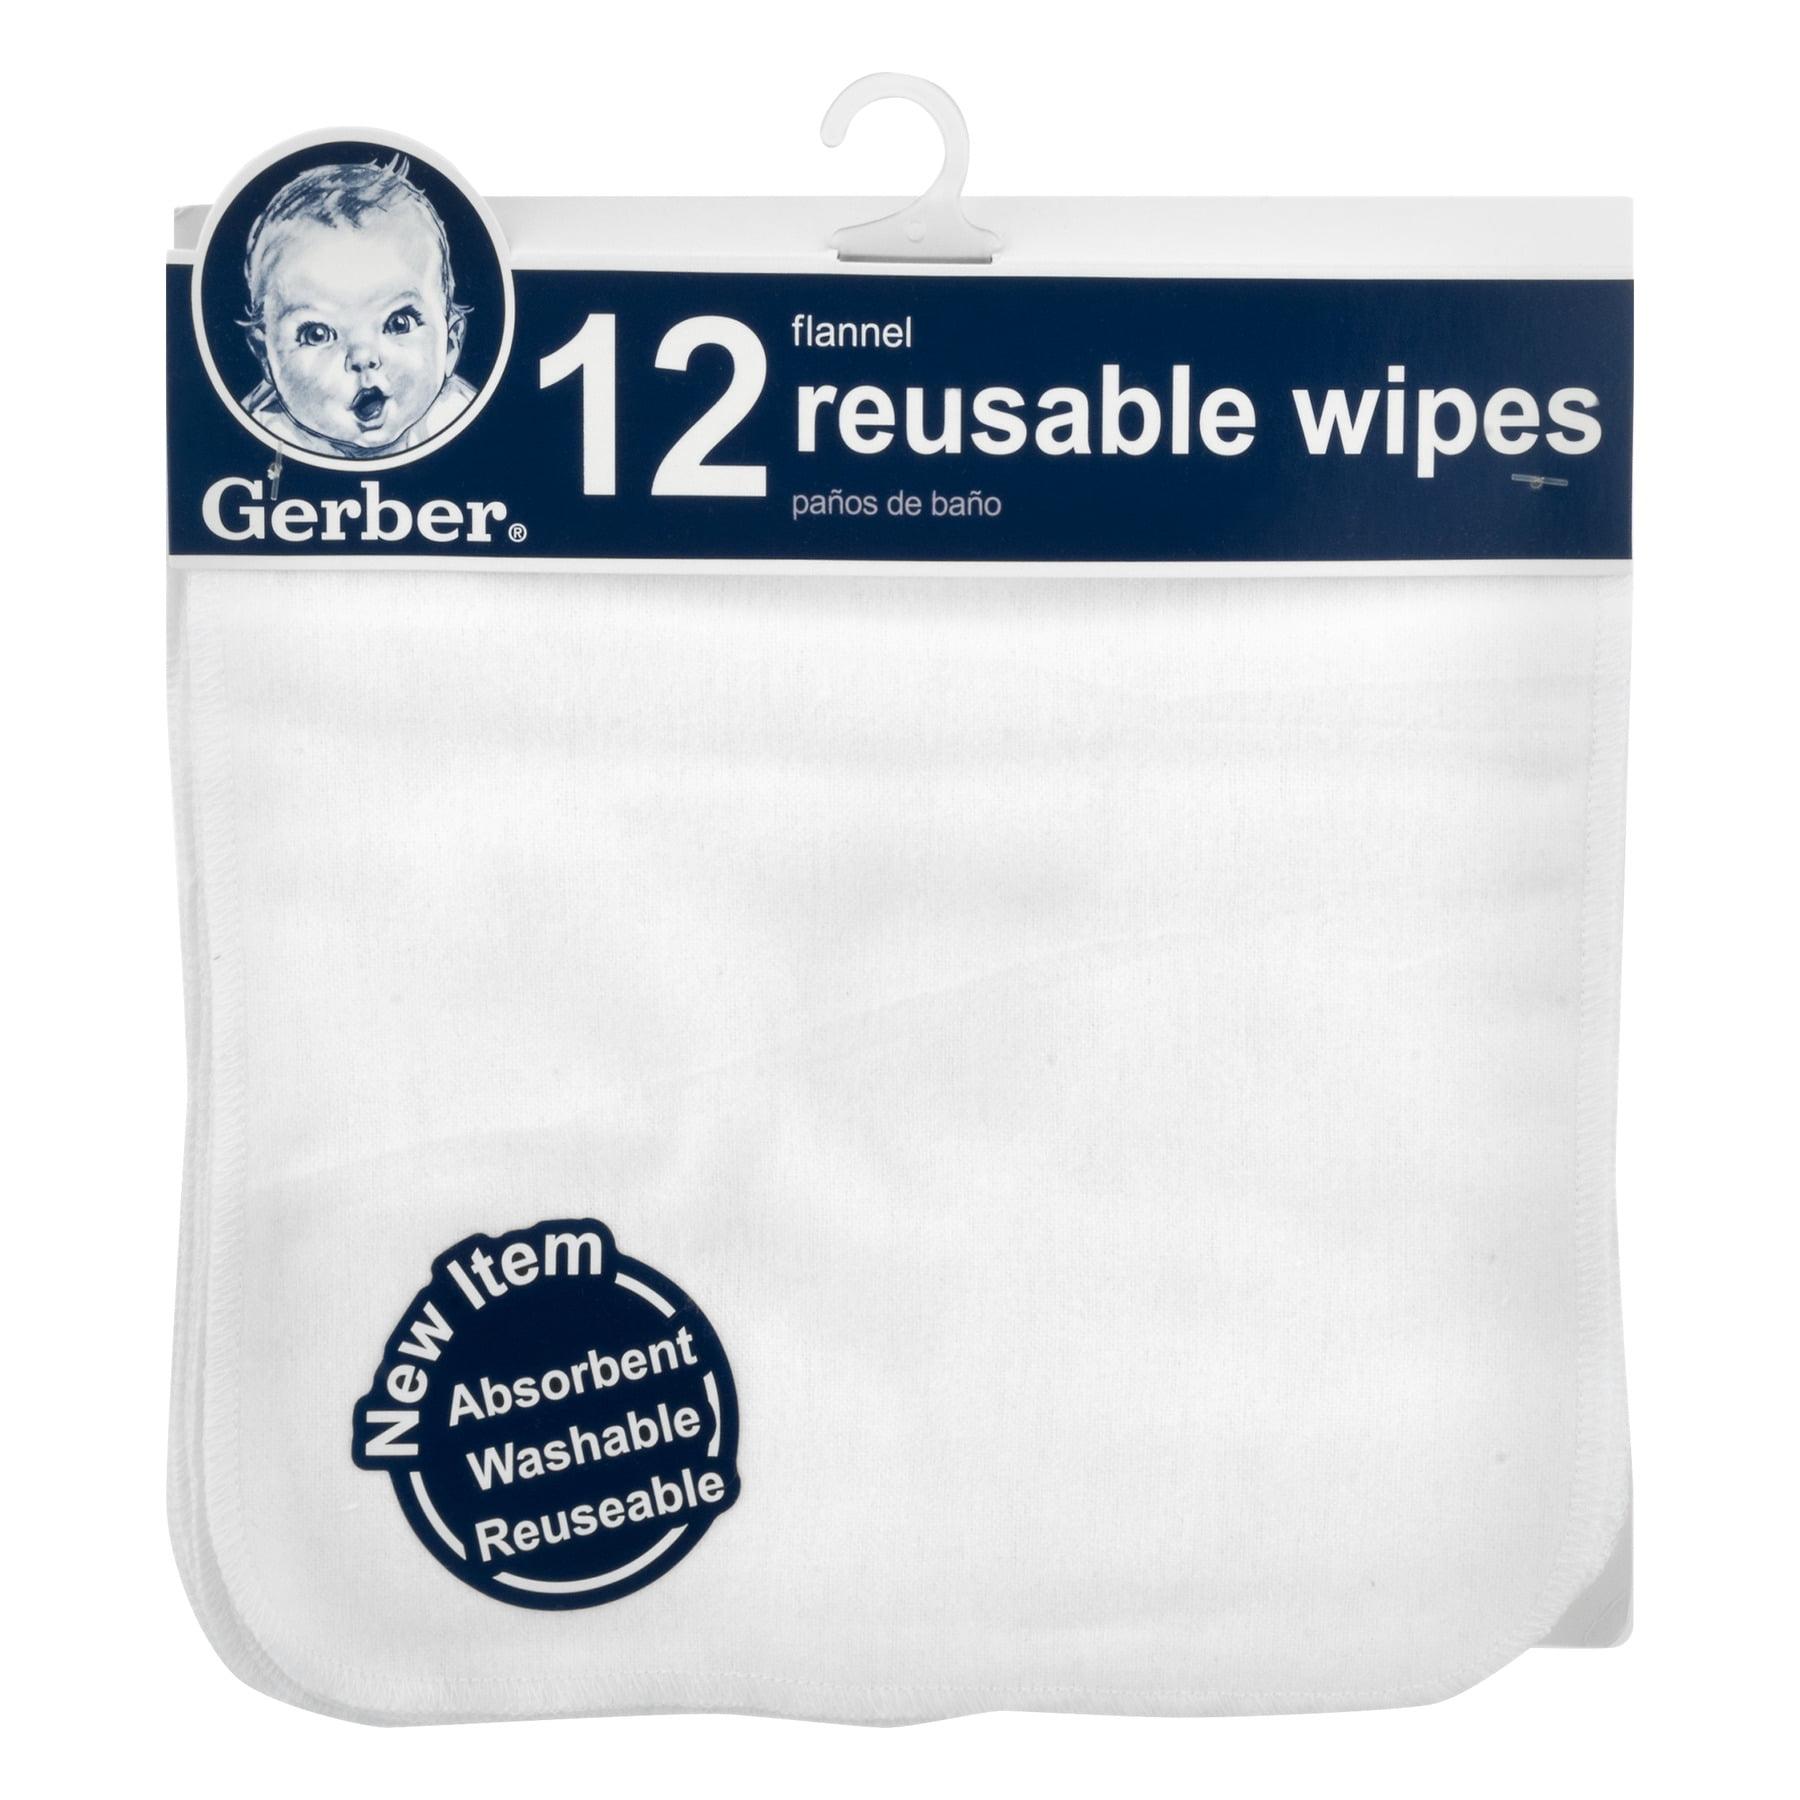 Gerber Flannel Reusable Wipes 12 CT12.0 CT by Gerber